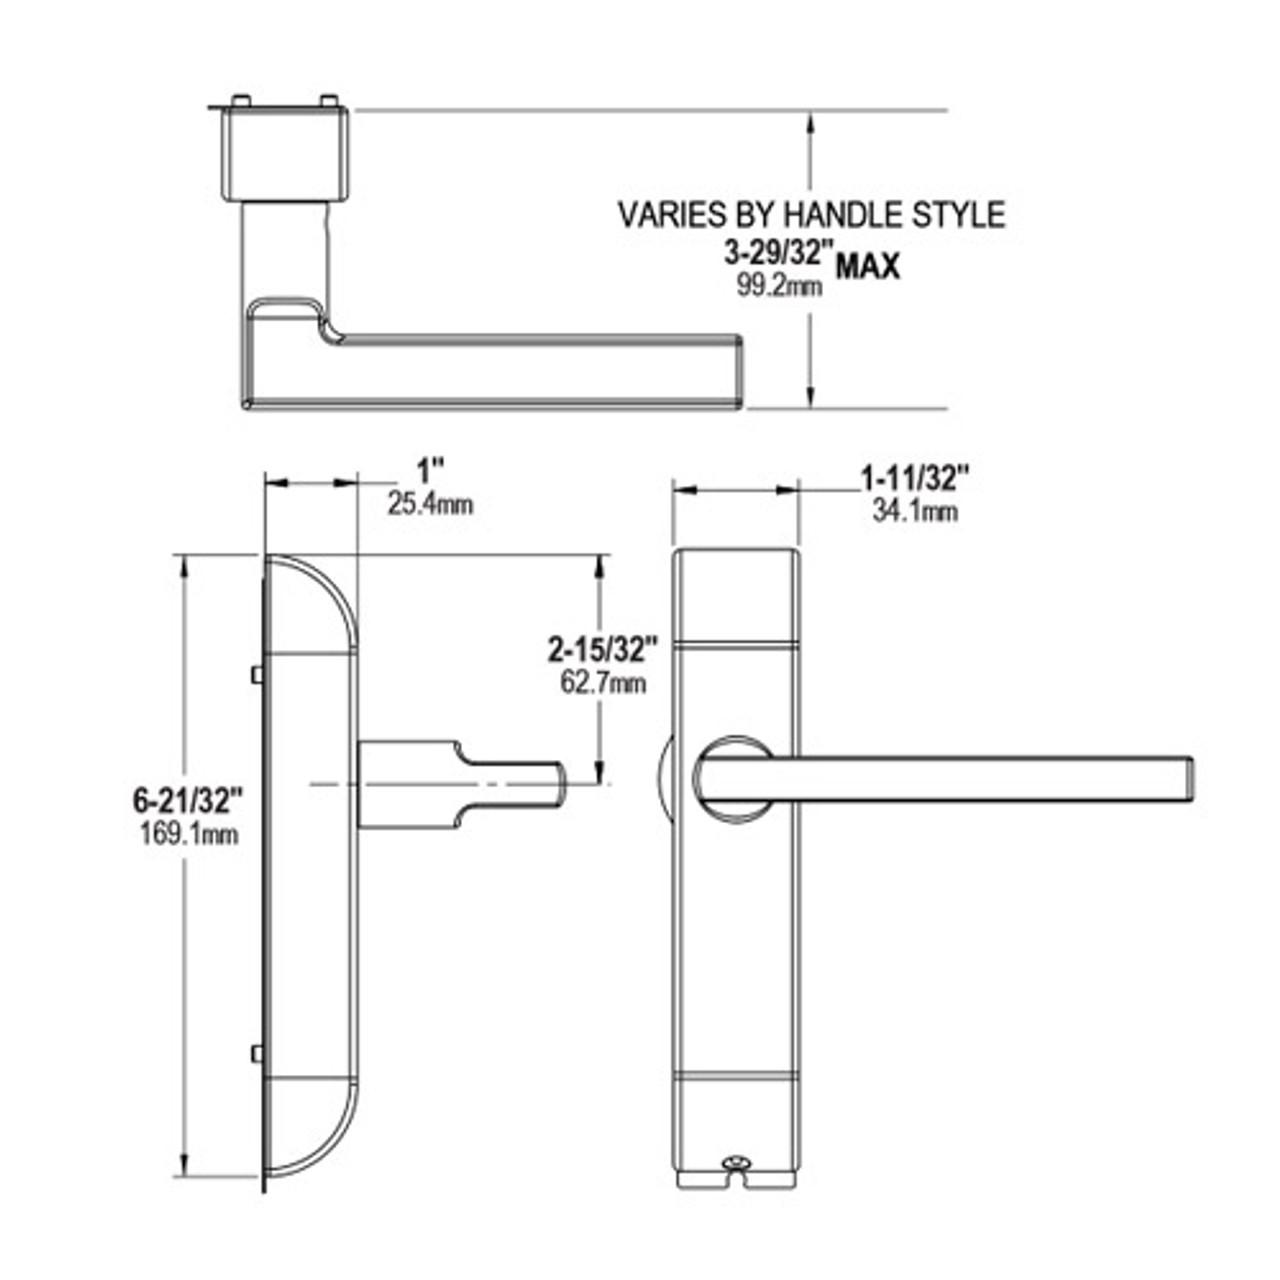 4600M-MD-652-US3 Adams Rite MD Designer handle Dimensional View